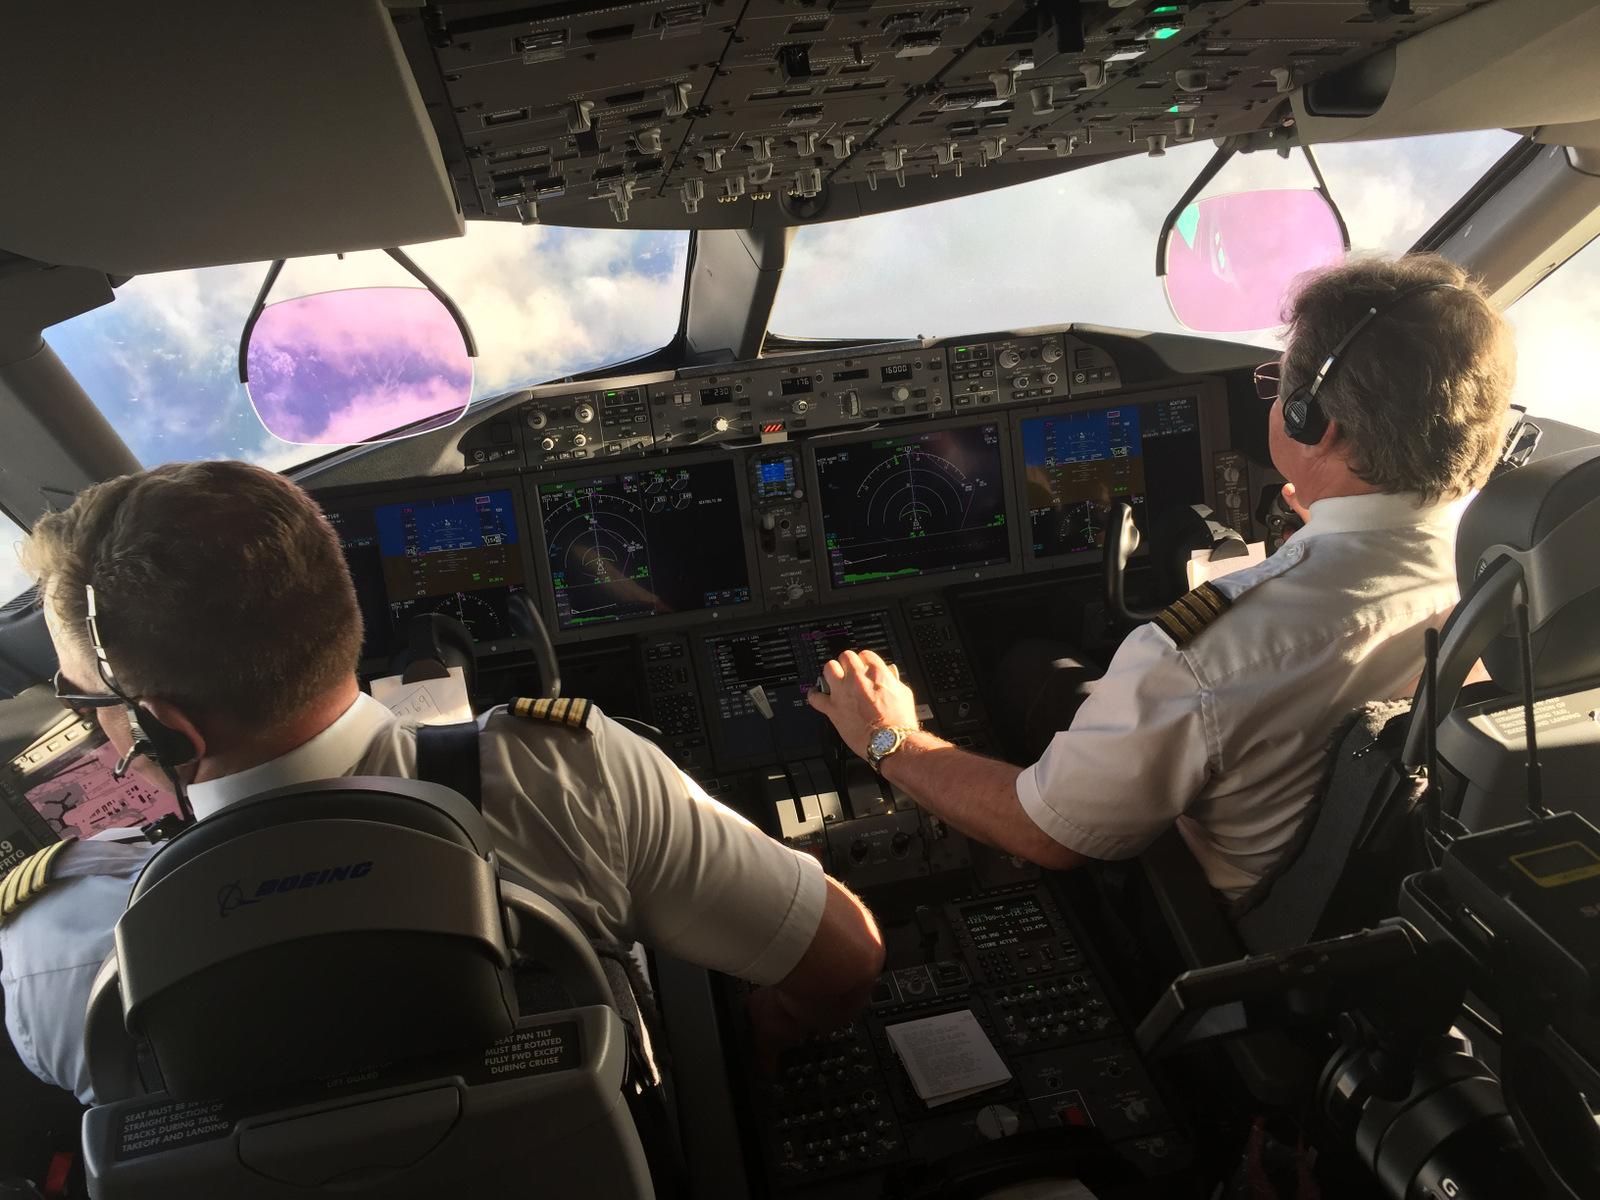 Captain Dave Butler handled comms, while Captain Mark Watt hand-flew the Dreamliner.